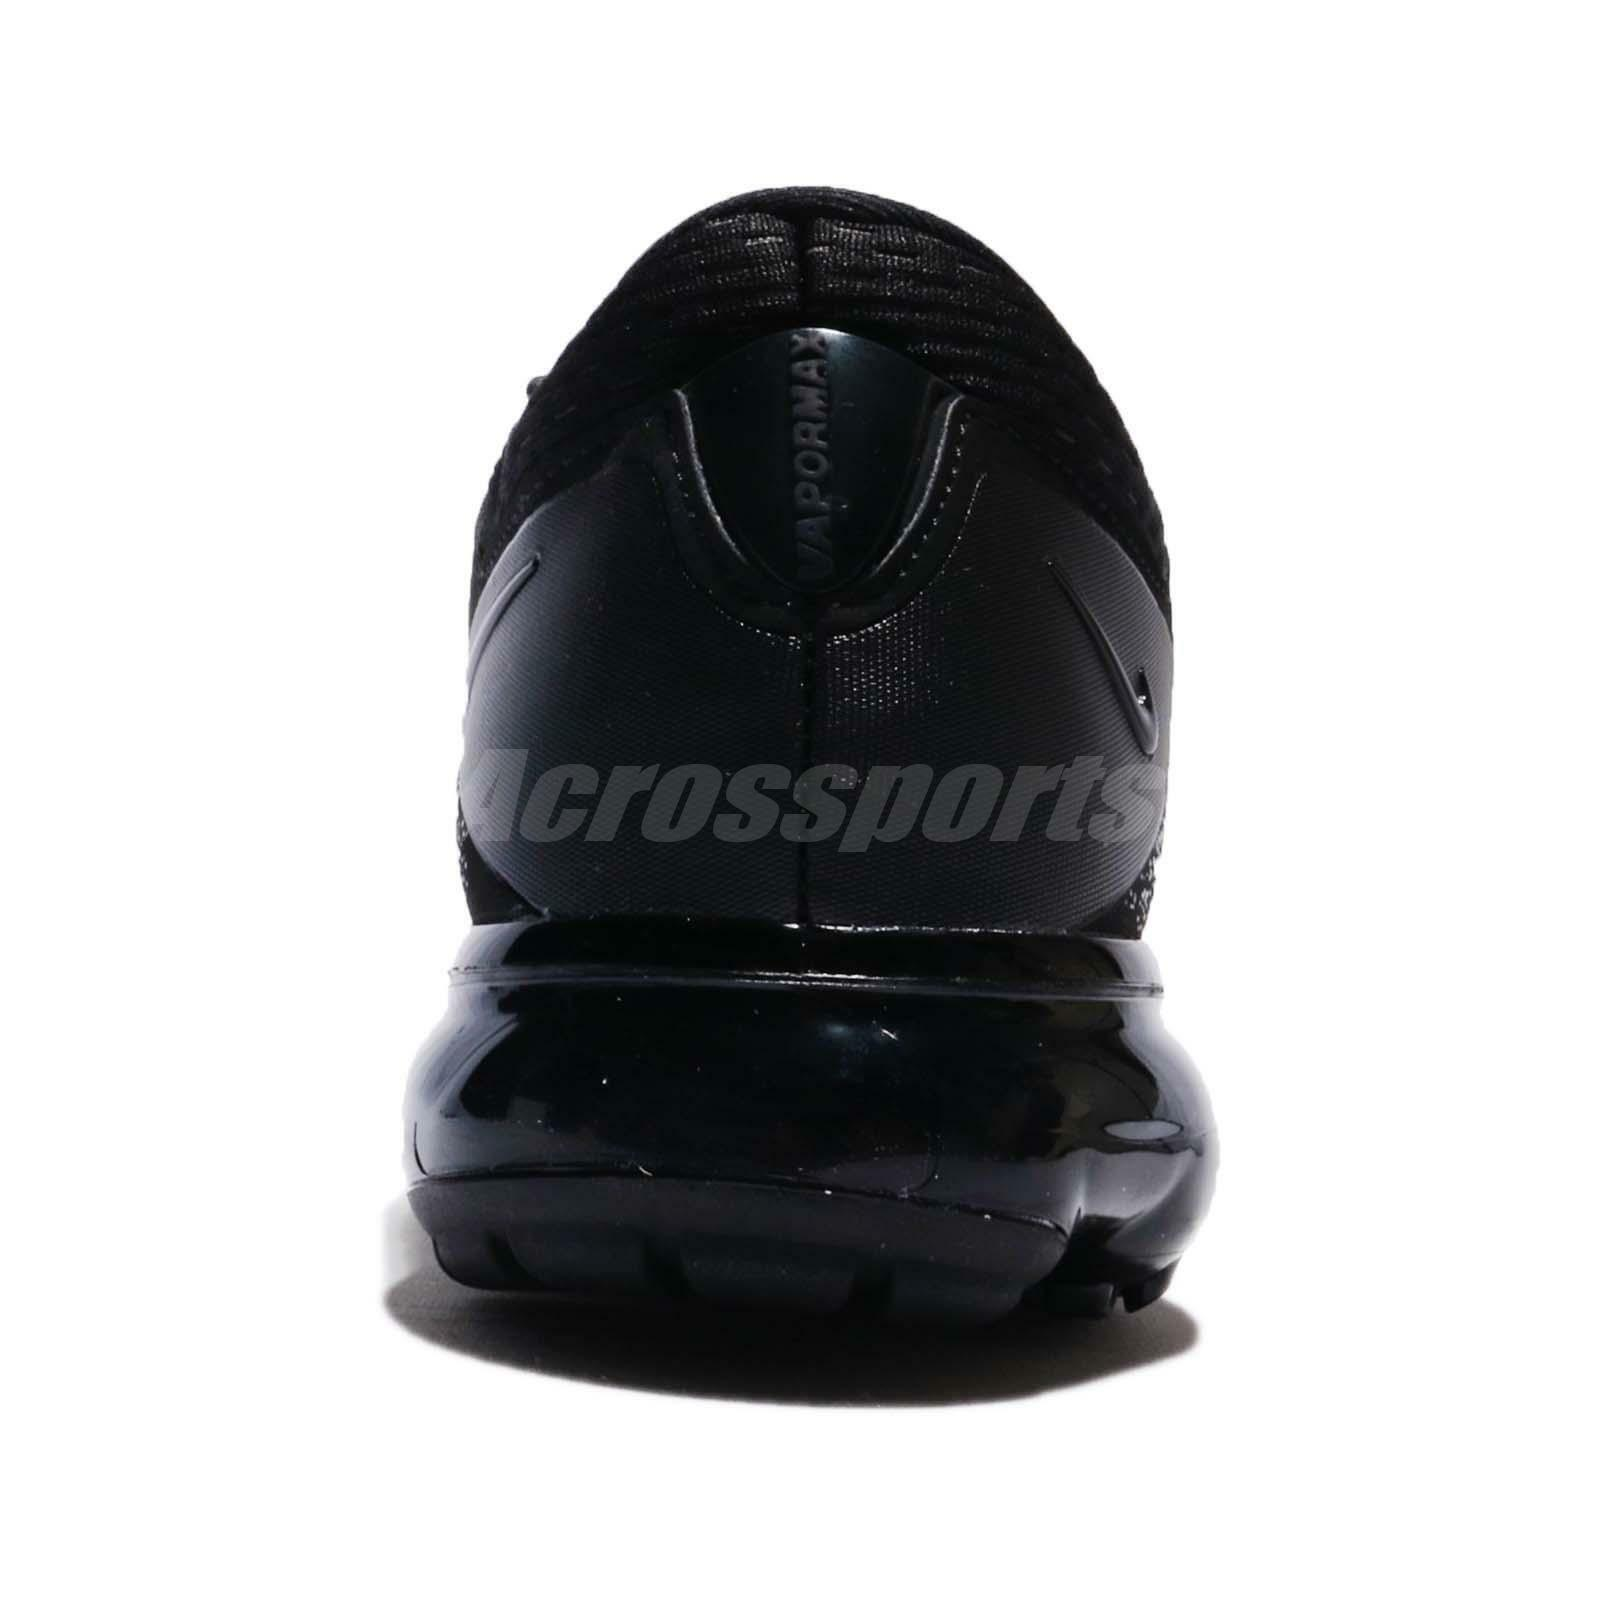 detailed look 6b5d7 b920a ... WMNS Nike Air vapormax Malla Triple Triple Triple Negro Mujer running  Shoes Sneakers ah9045-002 ...